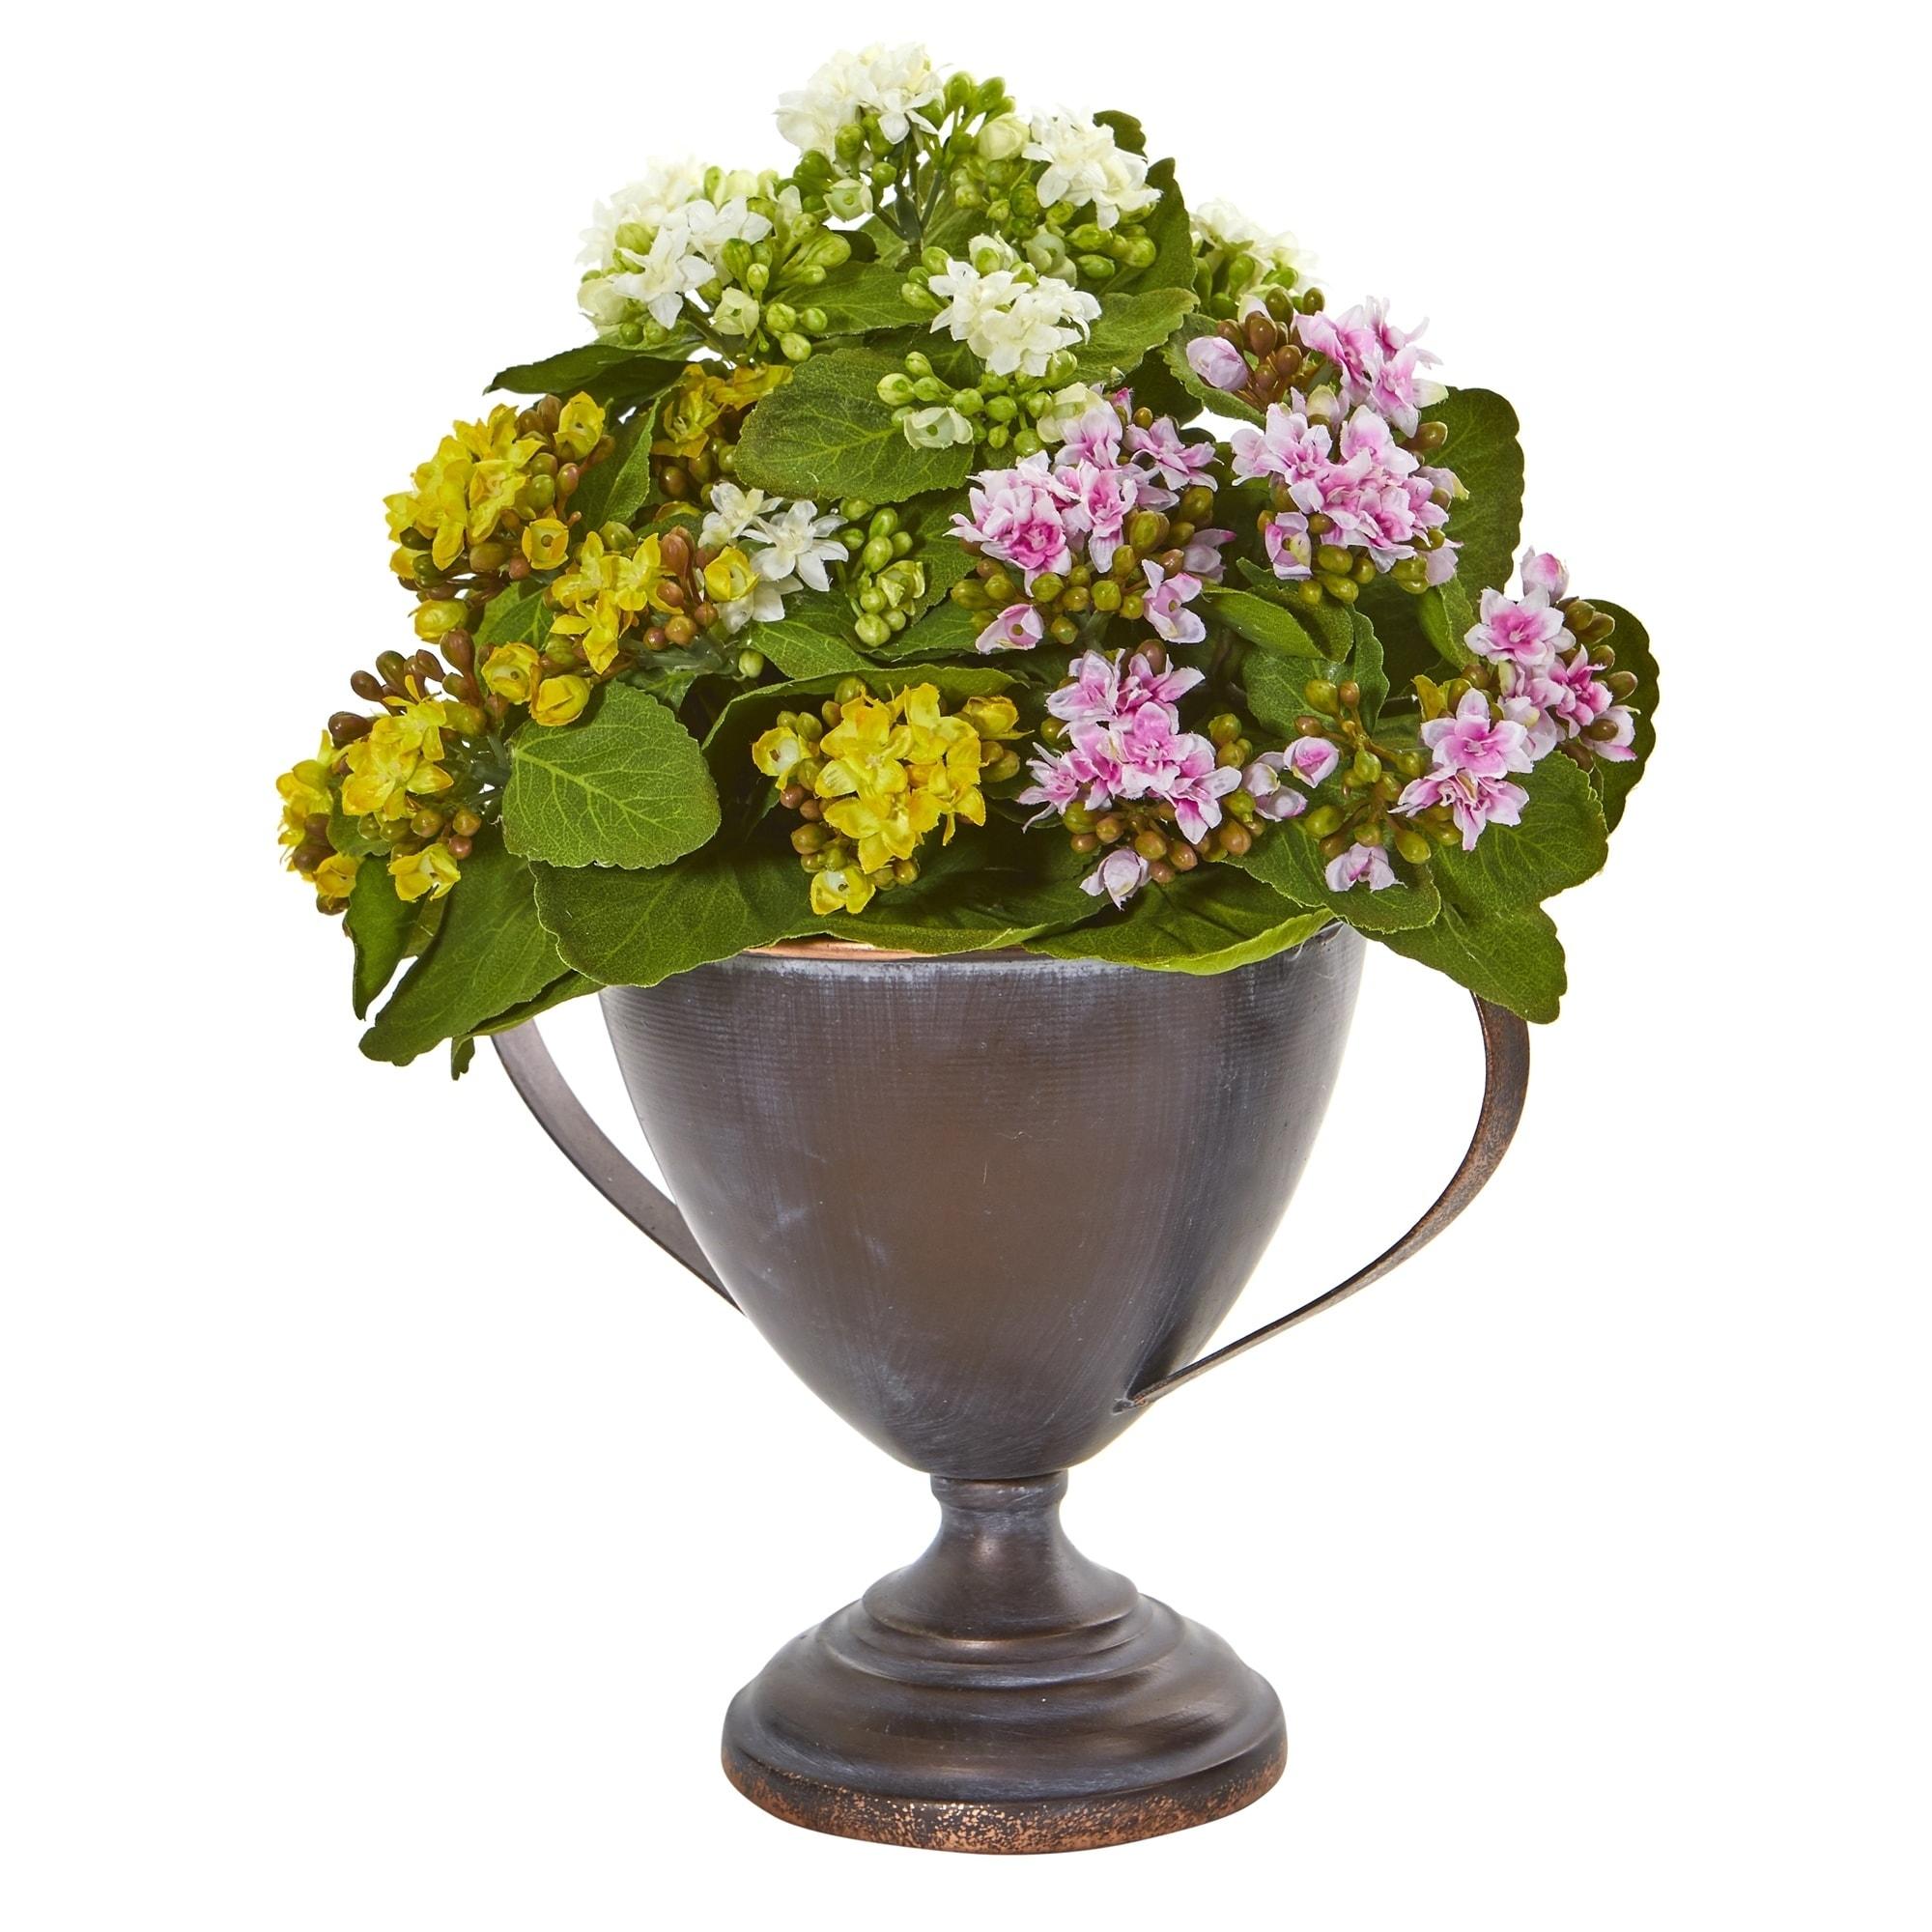 13 Kalanchoe Artificial Plant in Decorative Goblet